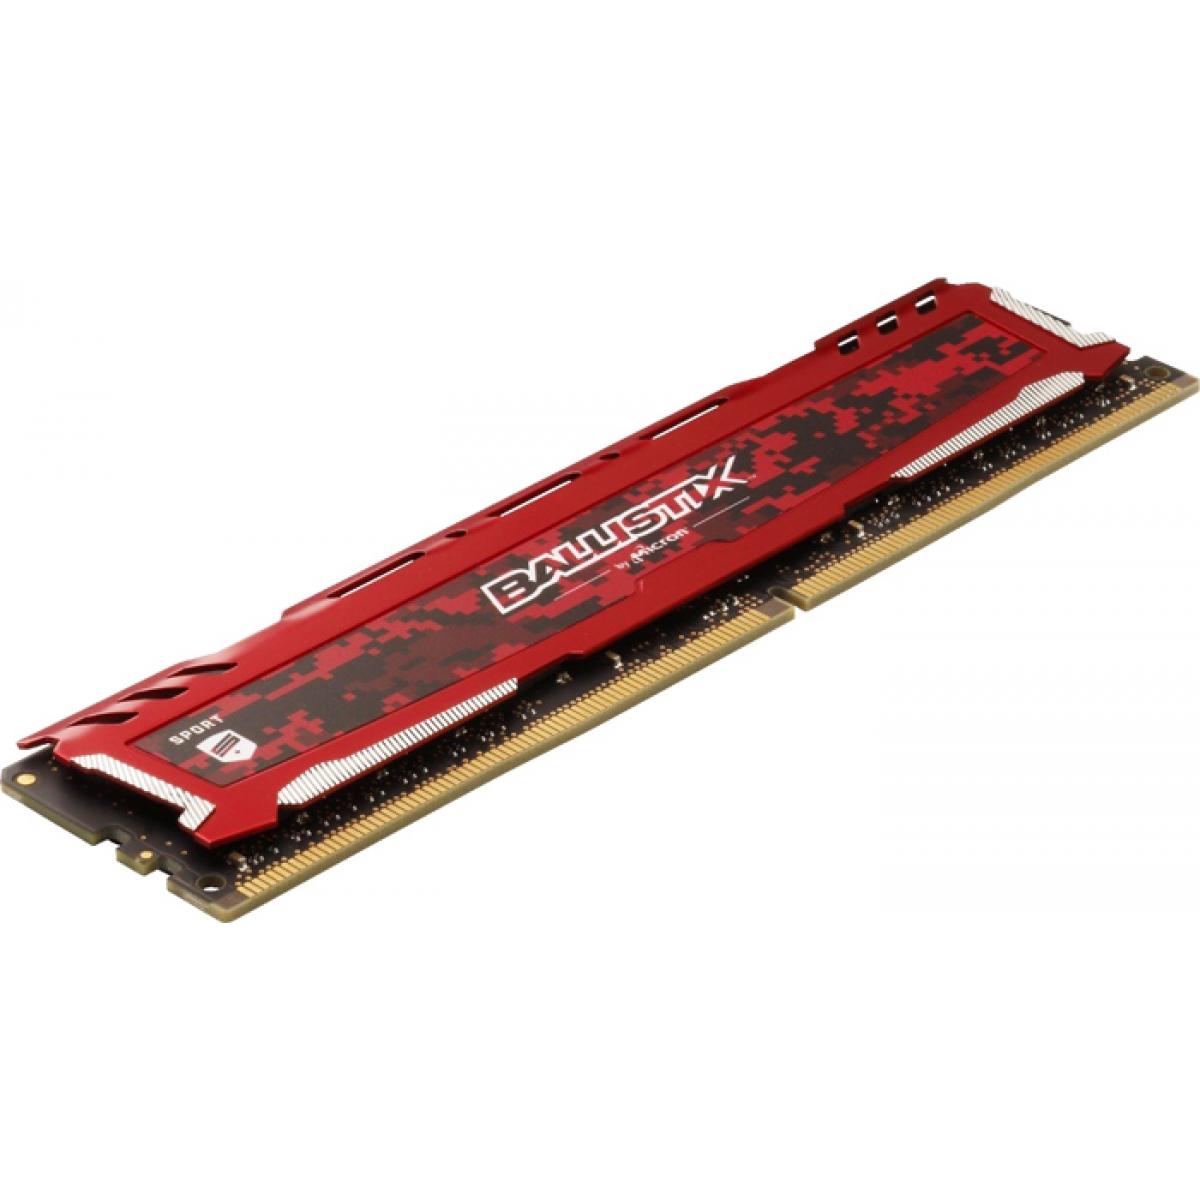 Memória DDR4 Crucial Ballistix Sport Lt, 8GB 3000MHz, Red, BLS8G4D30AESEK